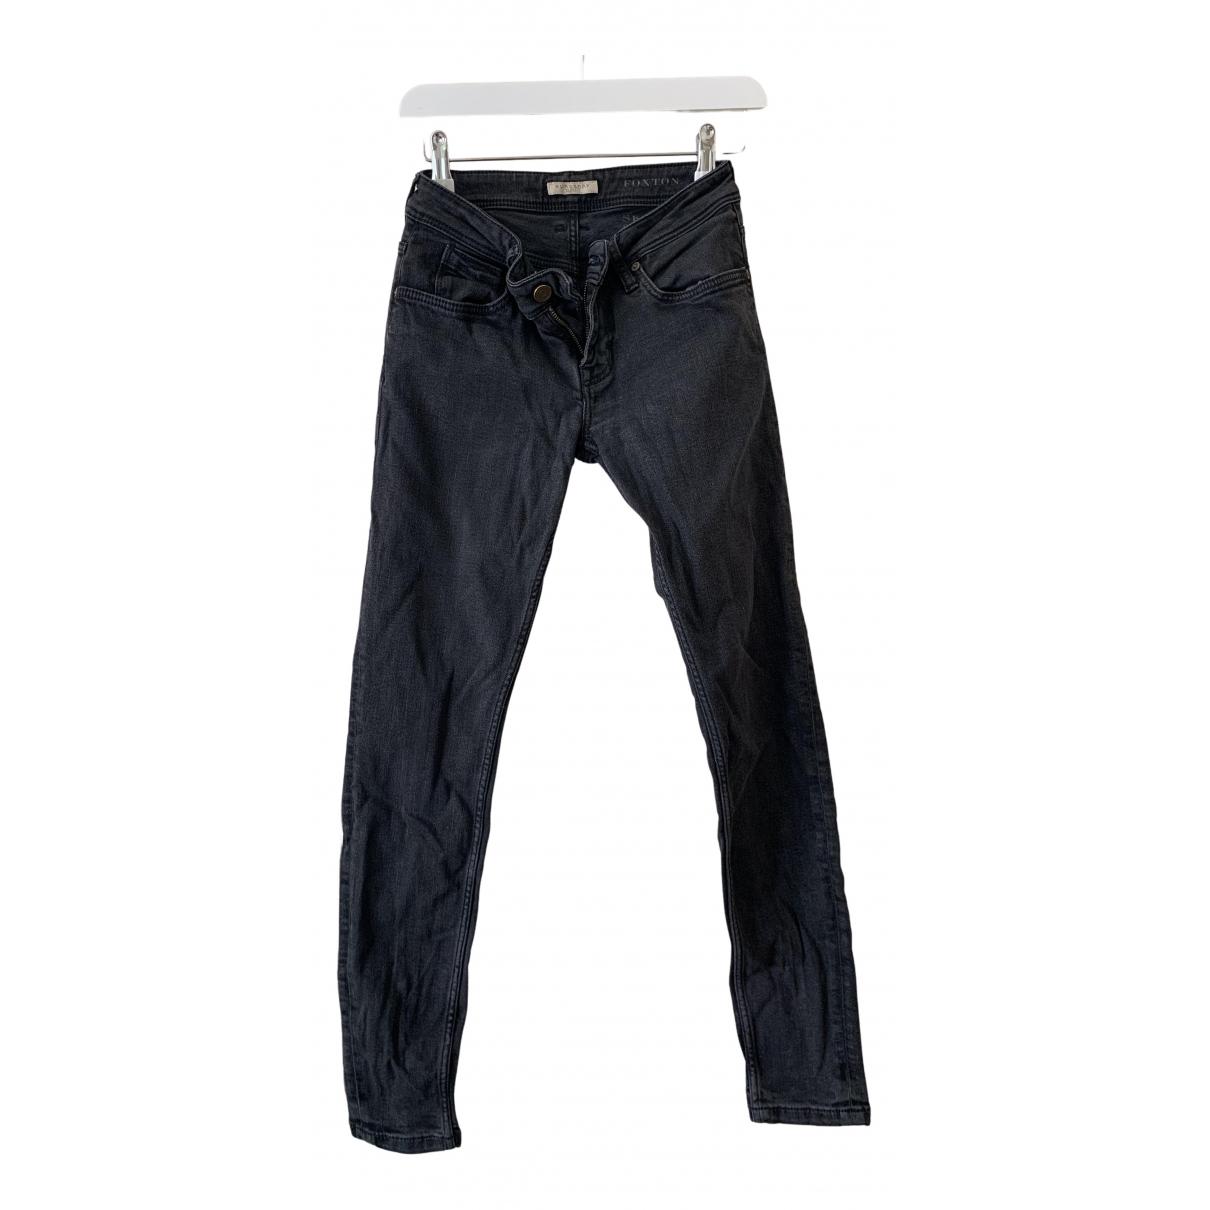 Burberry N Black Denim - Jeans Trousers for Women 8 UK